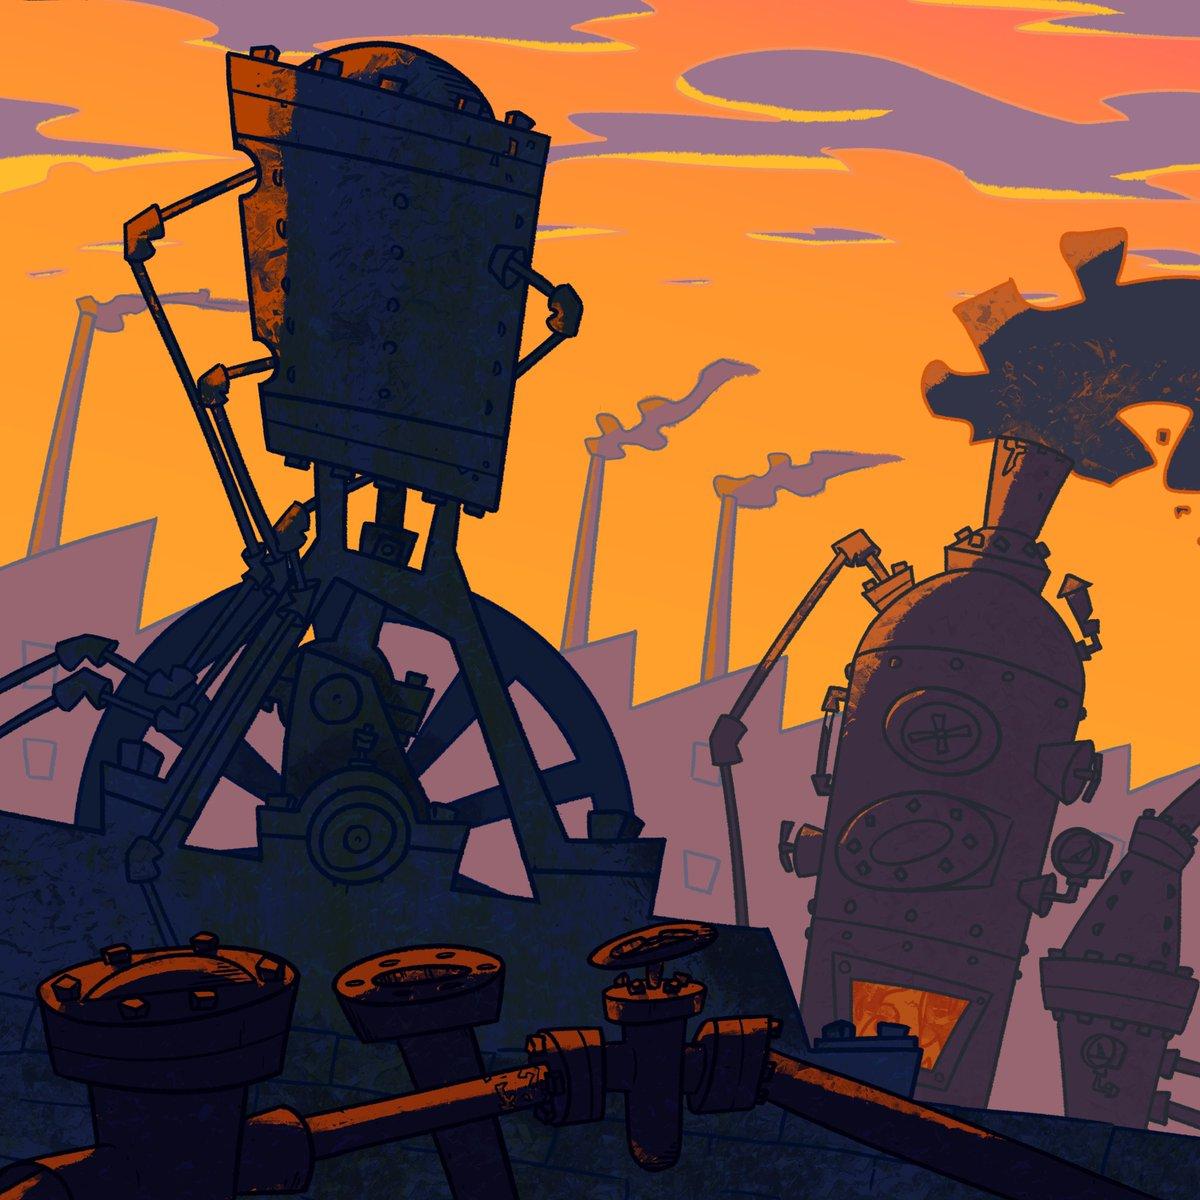 Catching up #steampunk #background #ComicArt #cartoon #digitalart